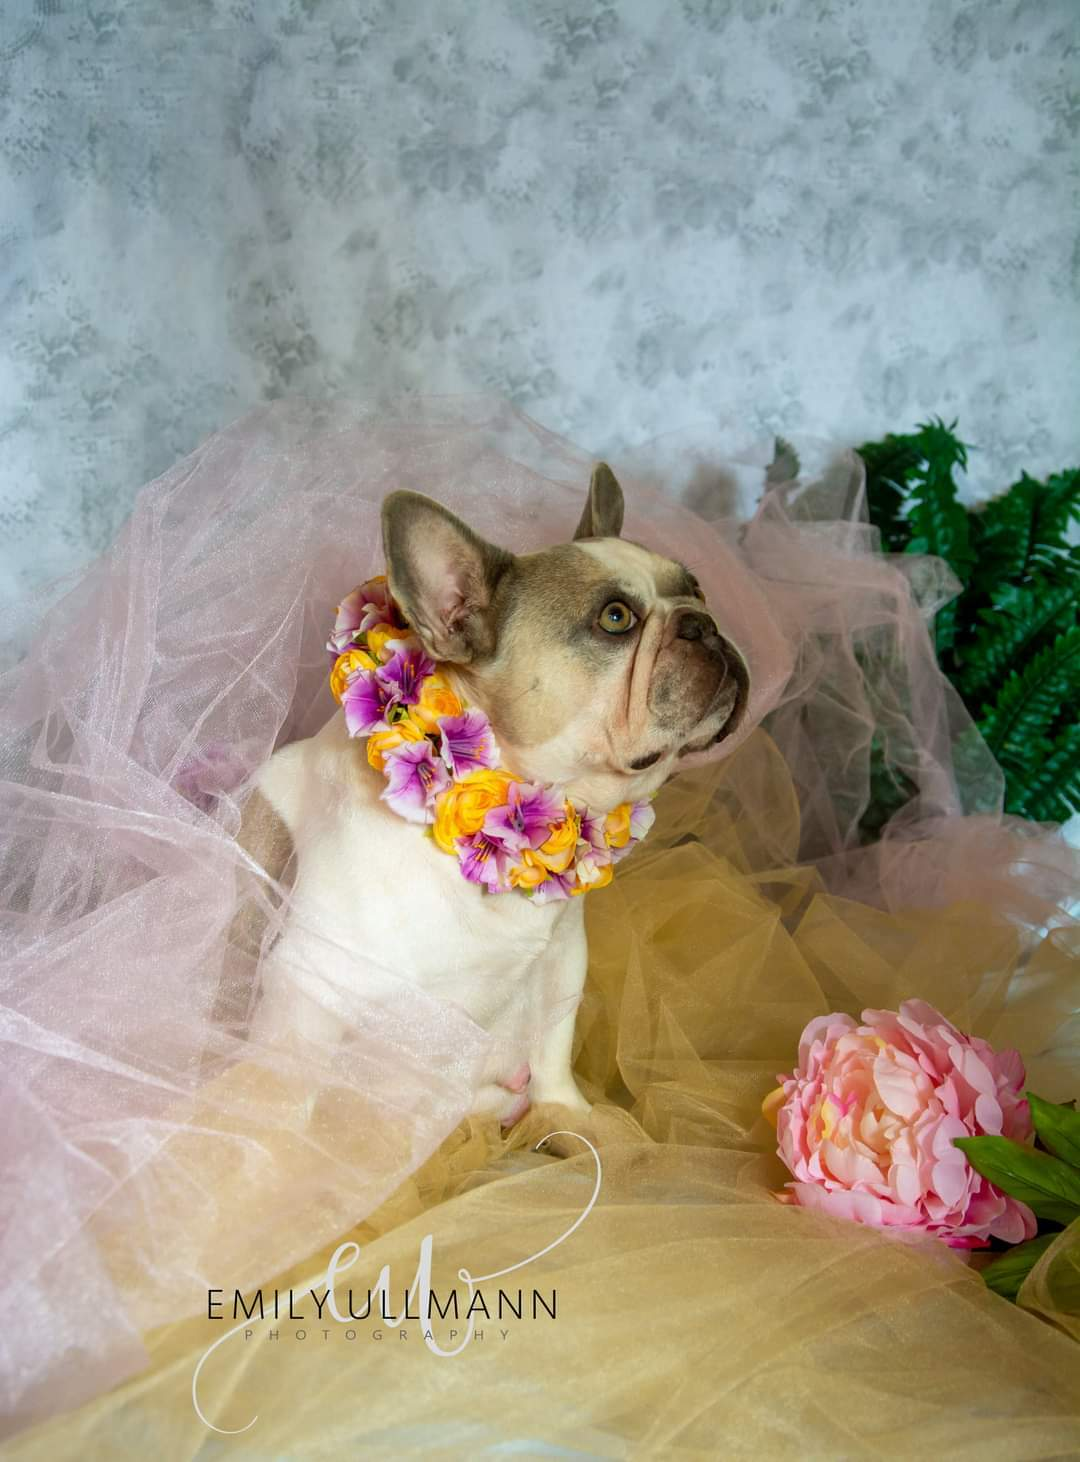 I Gave My French Bulldog Has Beautiful Maternity Shoot (6 Pics)